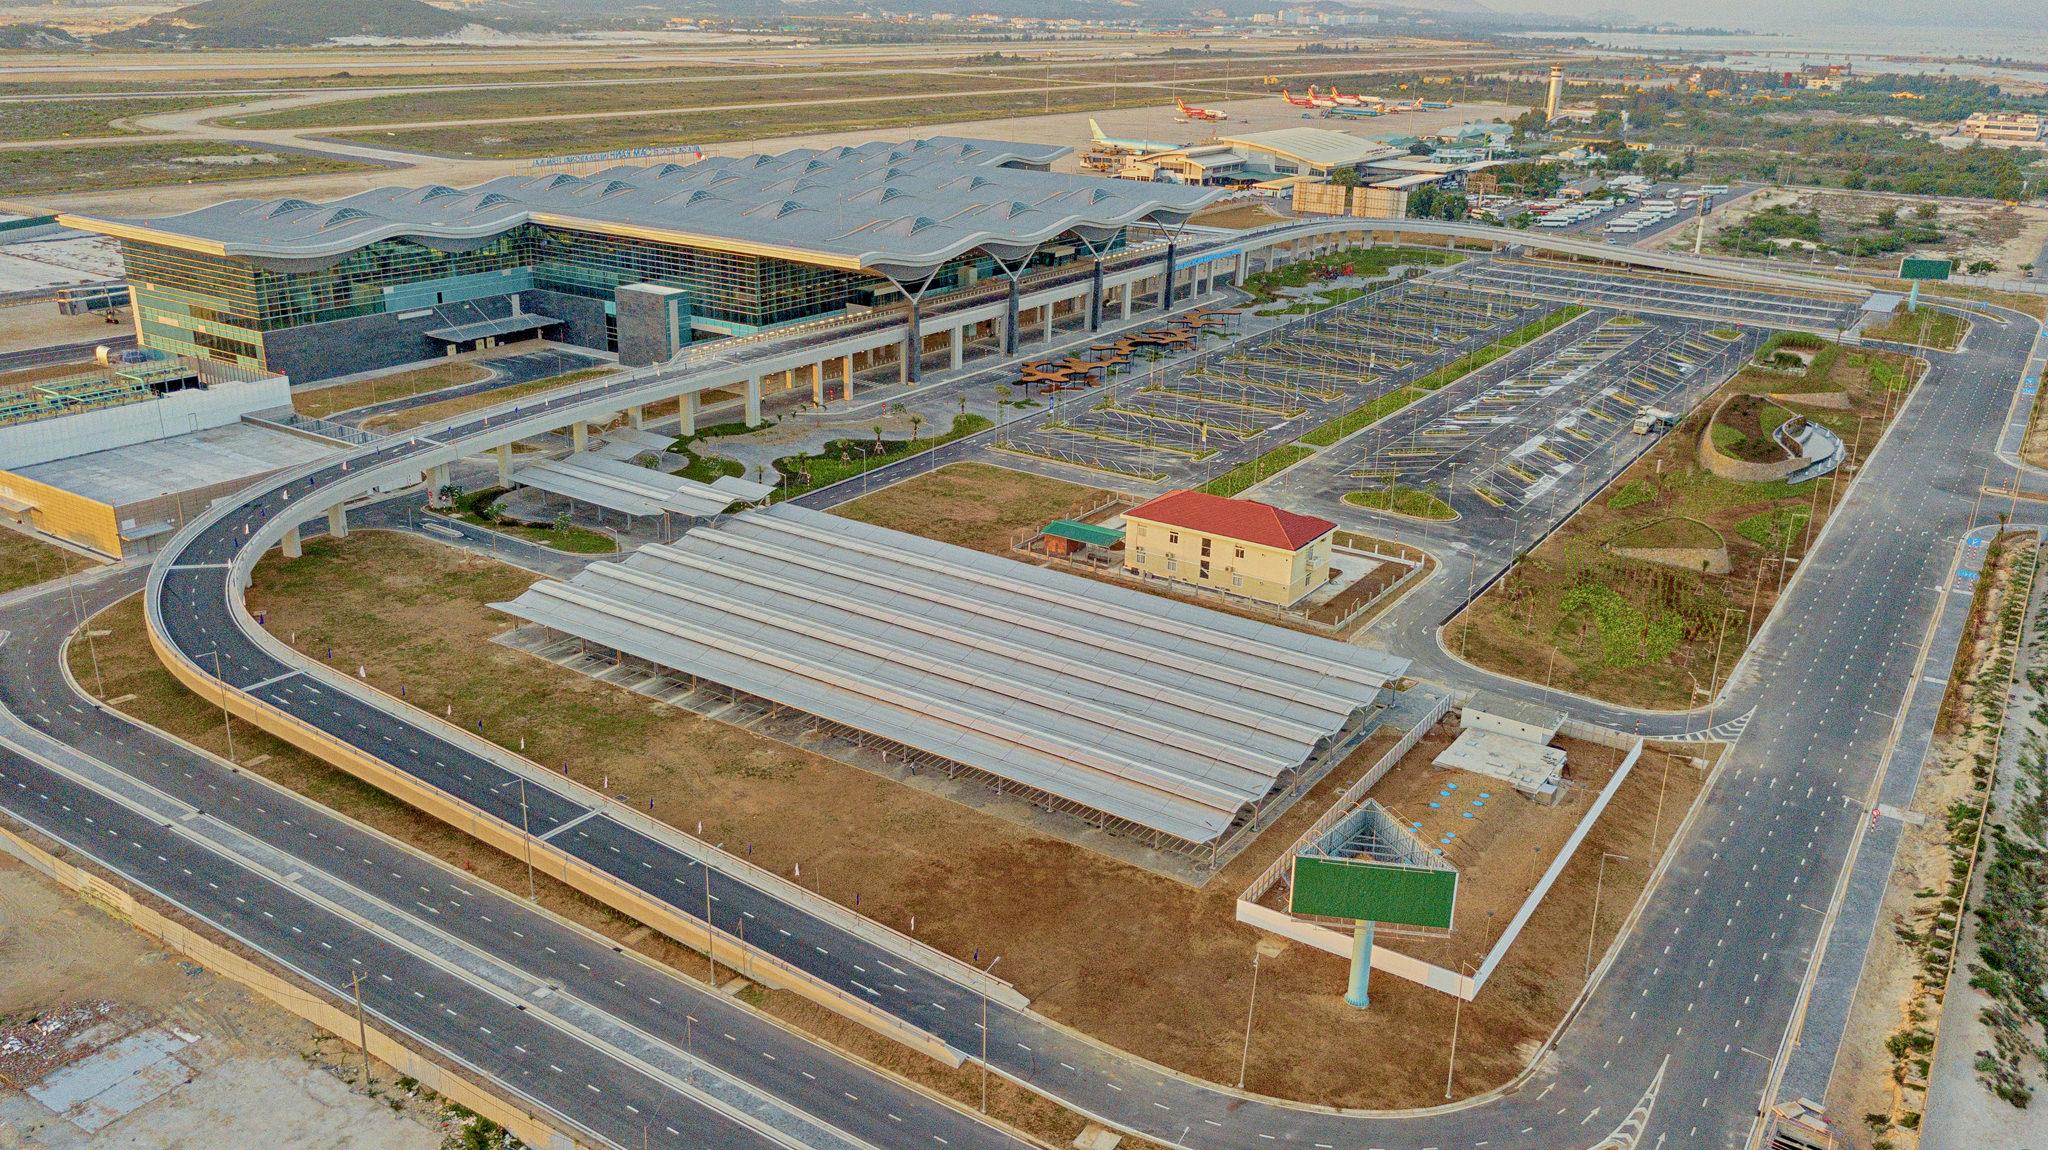 20180626 - Cam Ranh Airport - Architecture - Flycam - 0008.jpg